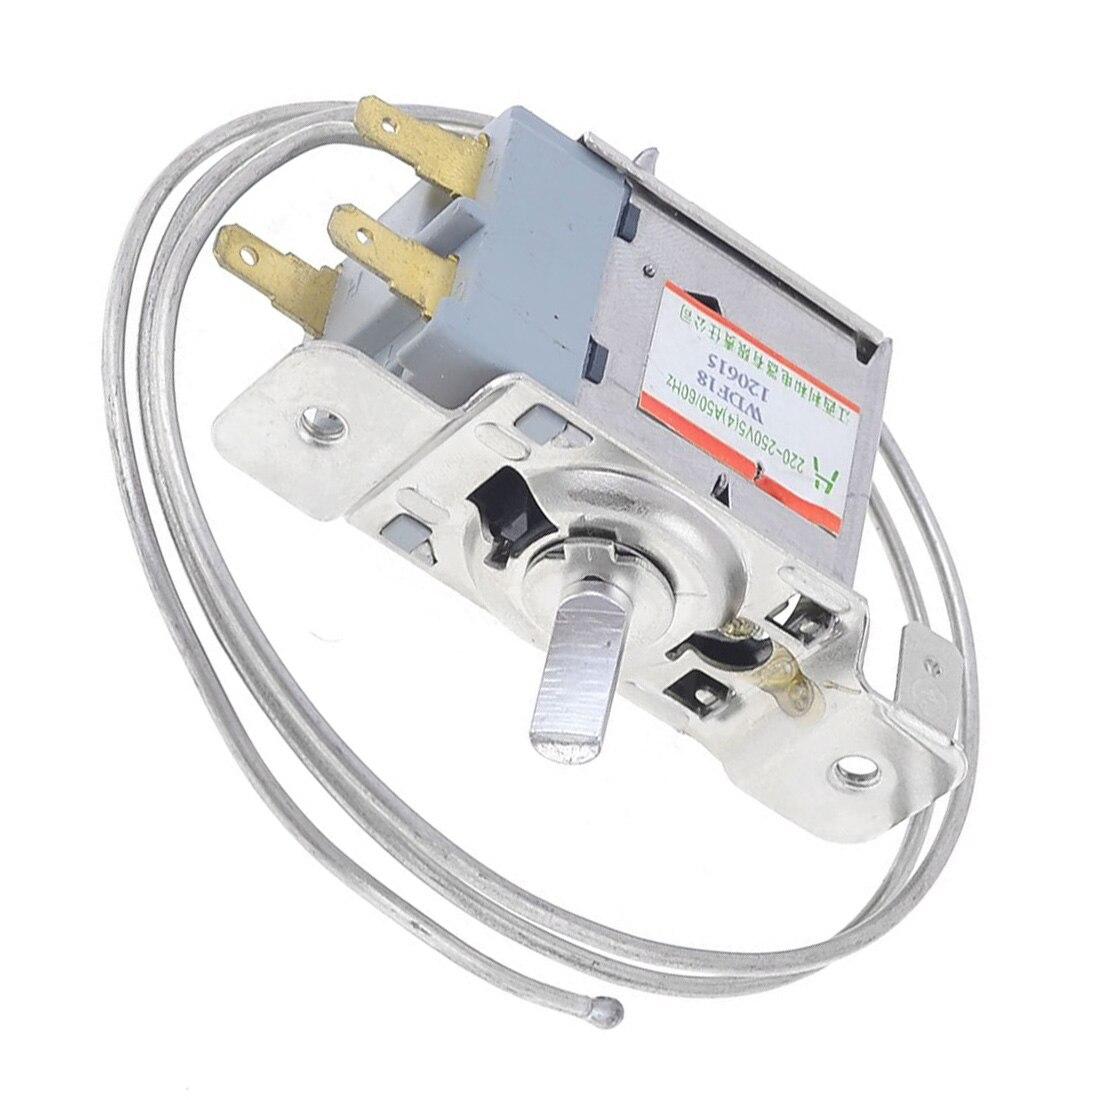 AC 220V-250V Volt 5(4)A 3-Pin 5.8mm Dia Shaft Refrigerator Thermostat  WDF18 Model 50/60Hz Refrigerator part